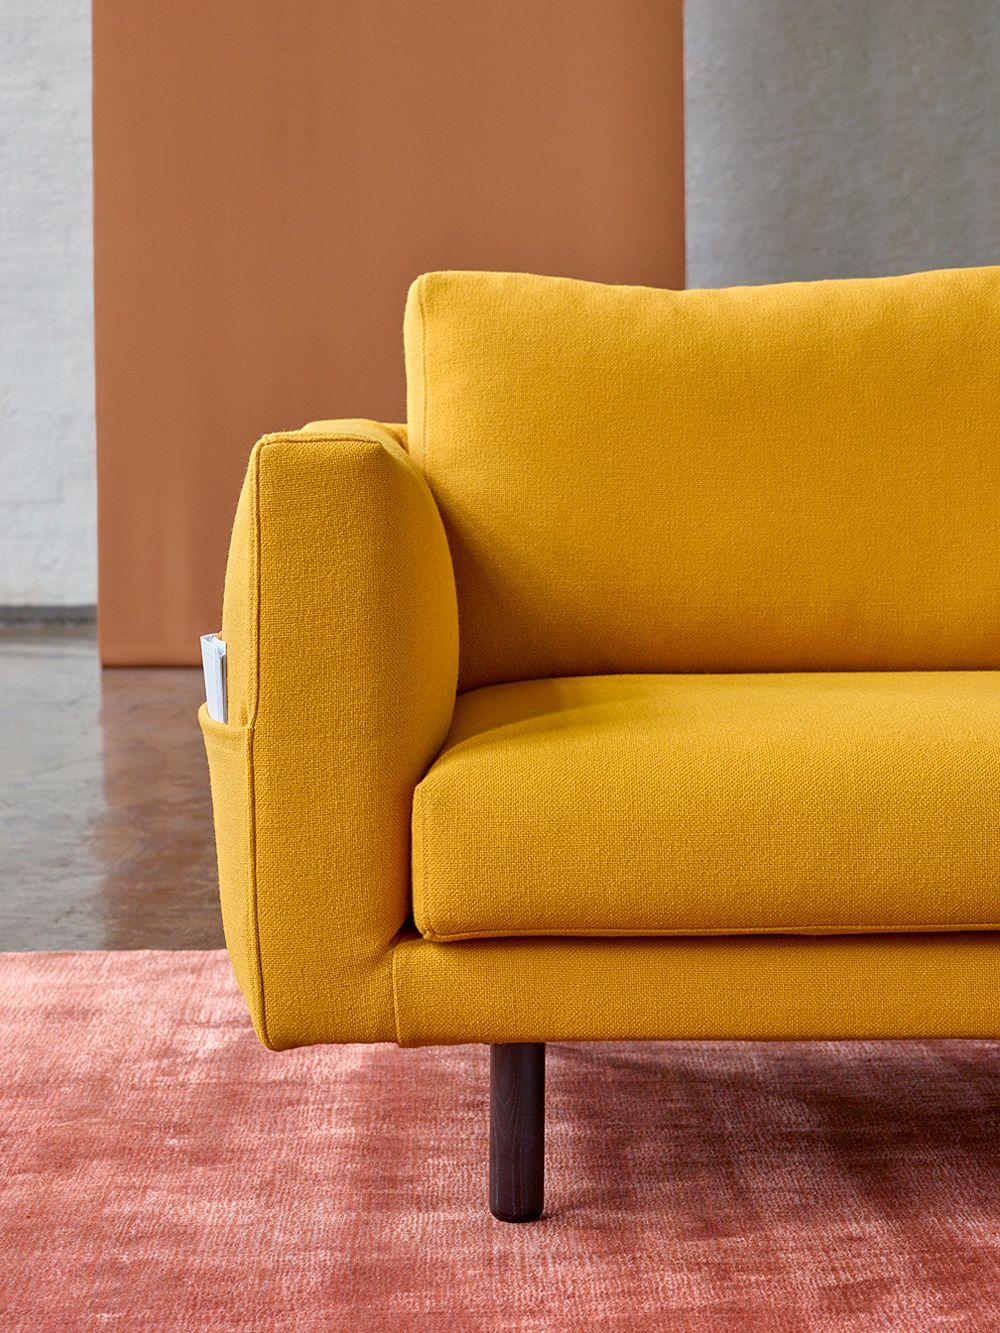 Hakola Cosy Pocket Wool sofa in saffron yellow